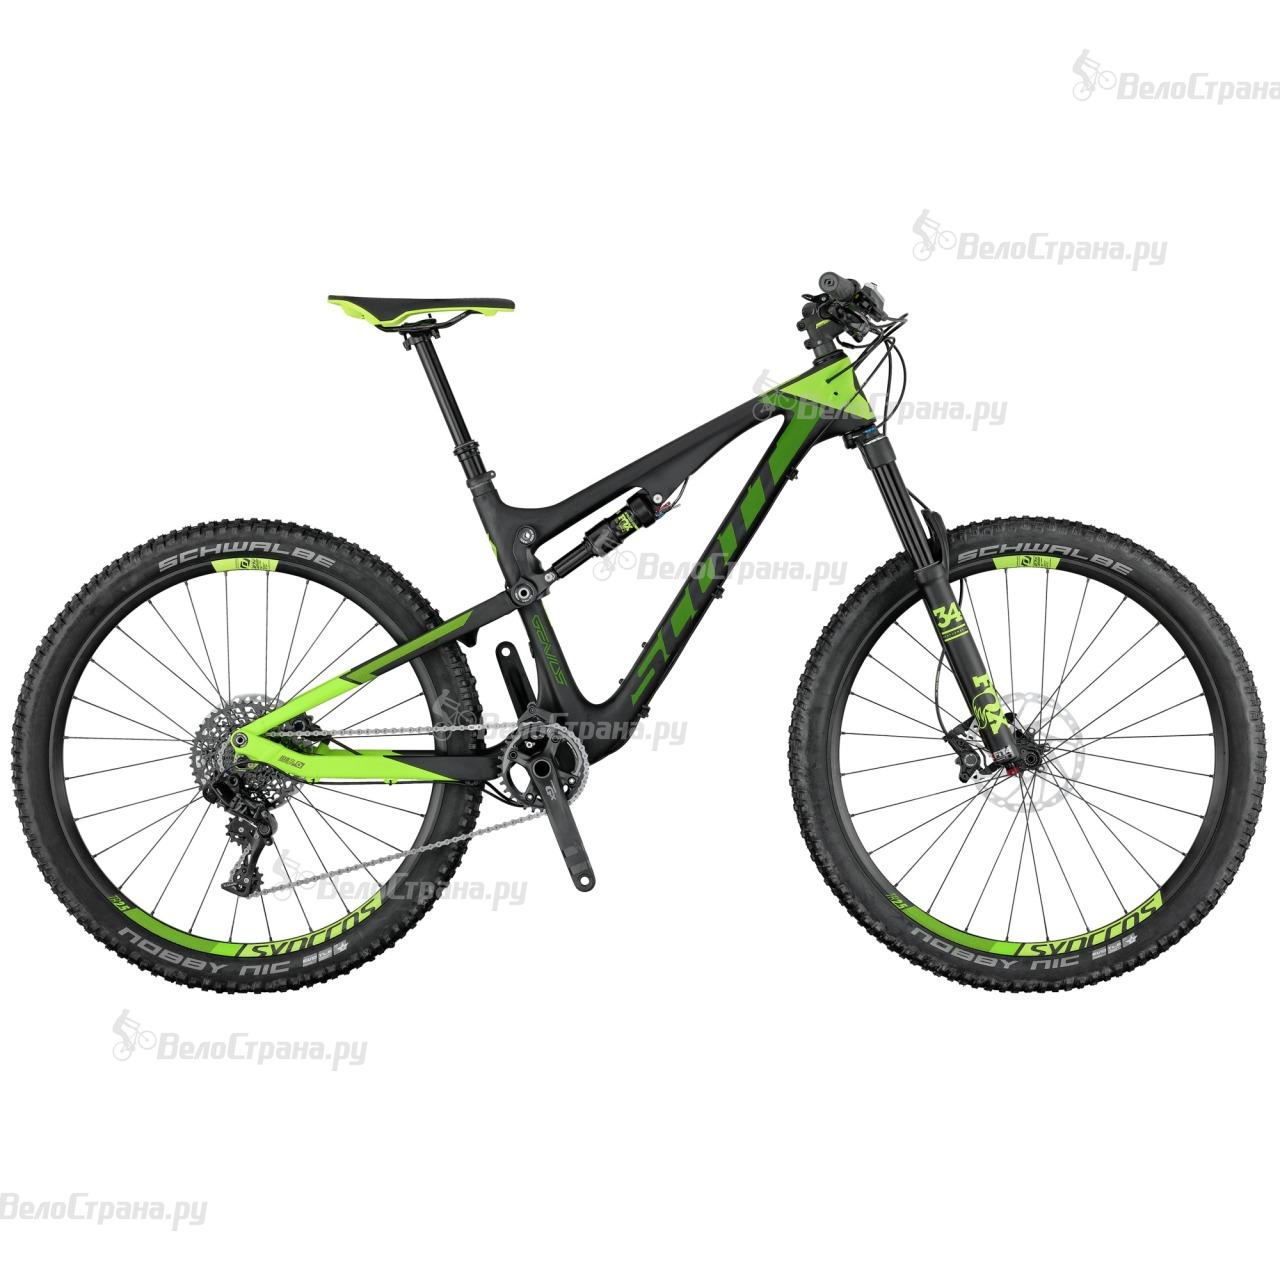 Велосипед Scott Genius 920 (2017) велосипед scott genius lt 700 tuned plus 2016